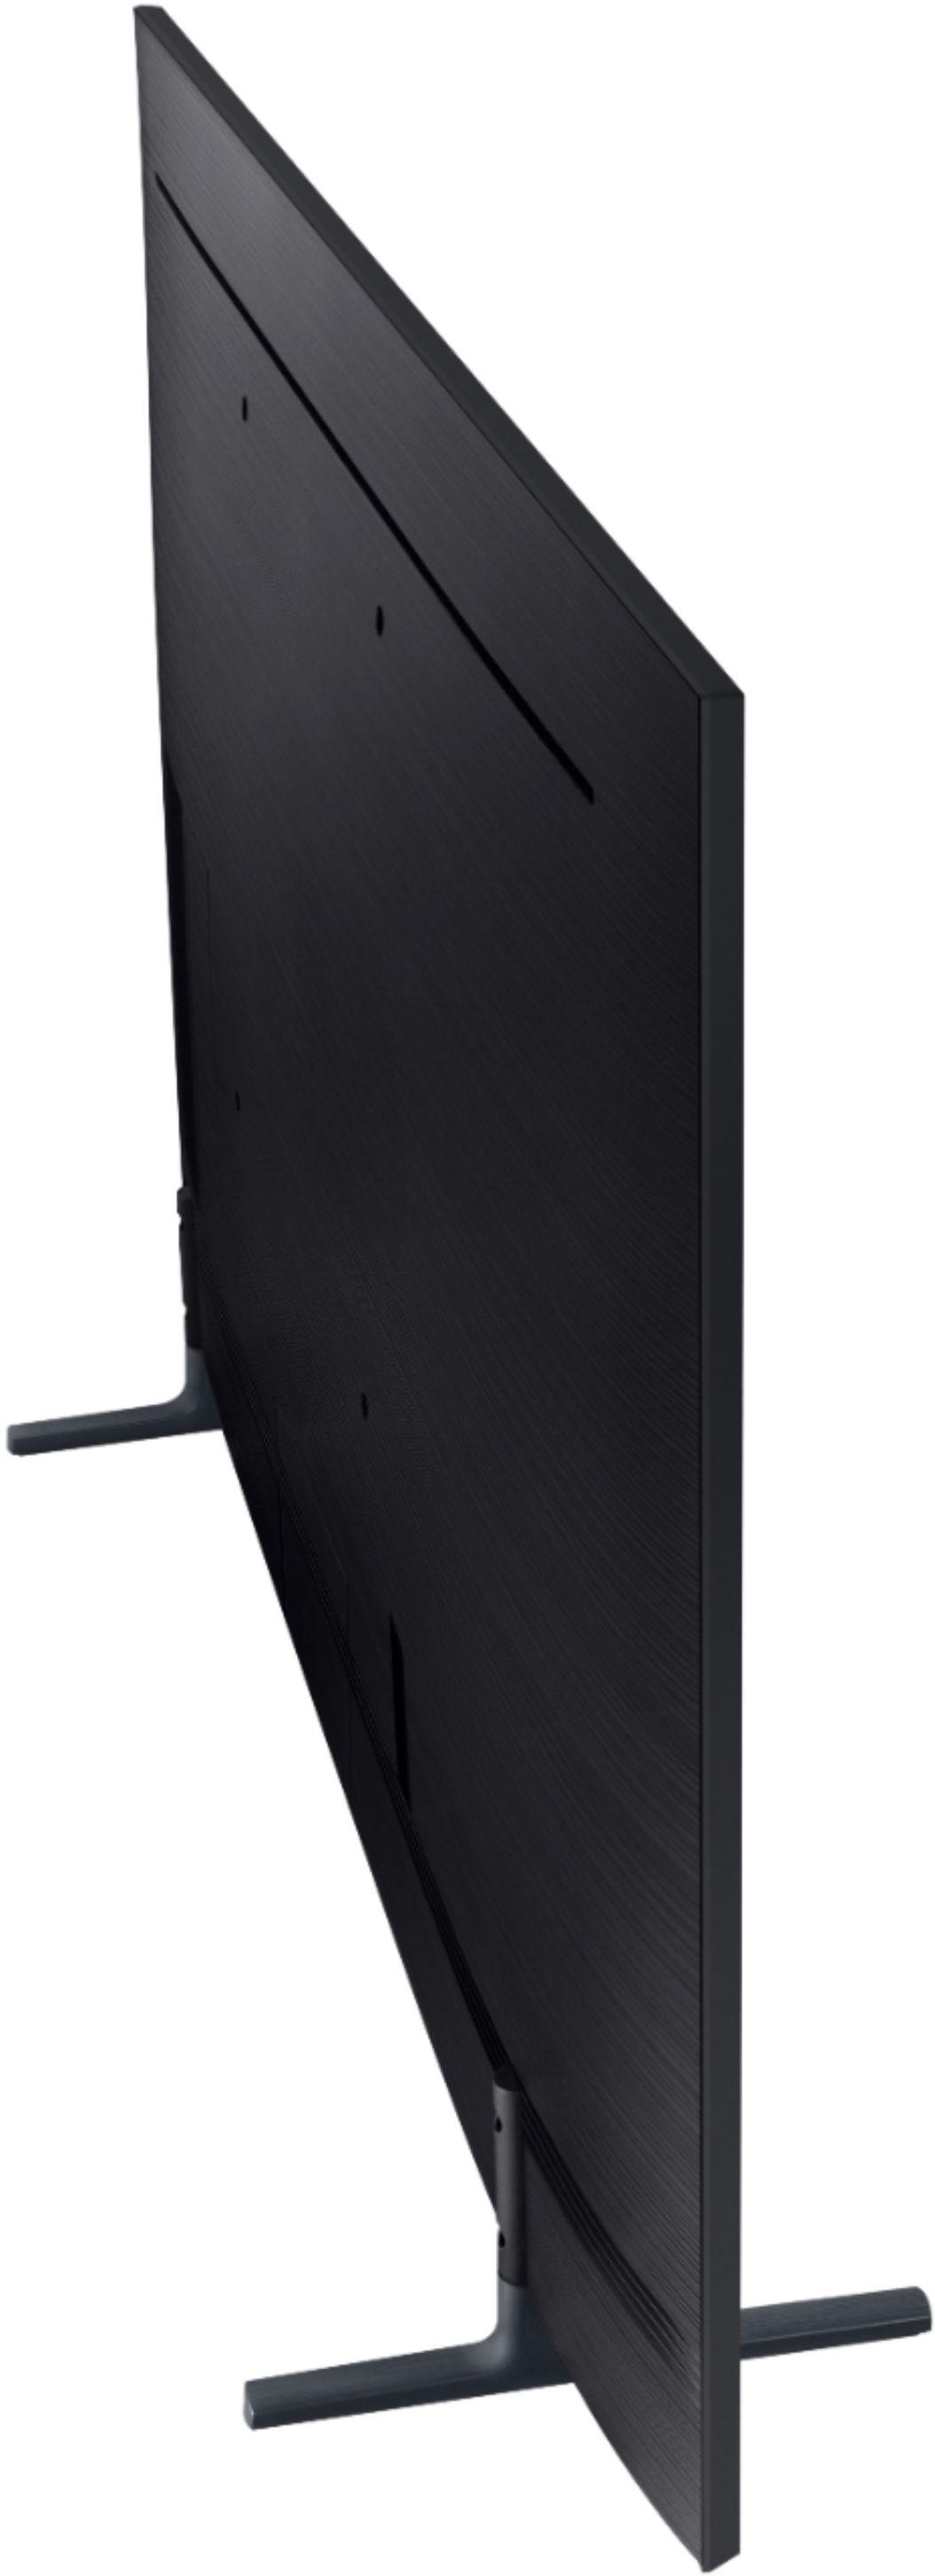 Image 12 for Samsung UN75RU8000FXZA